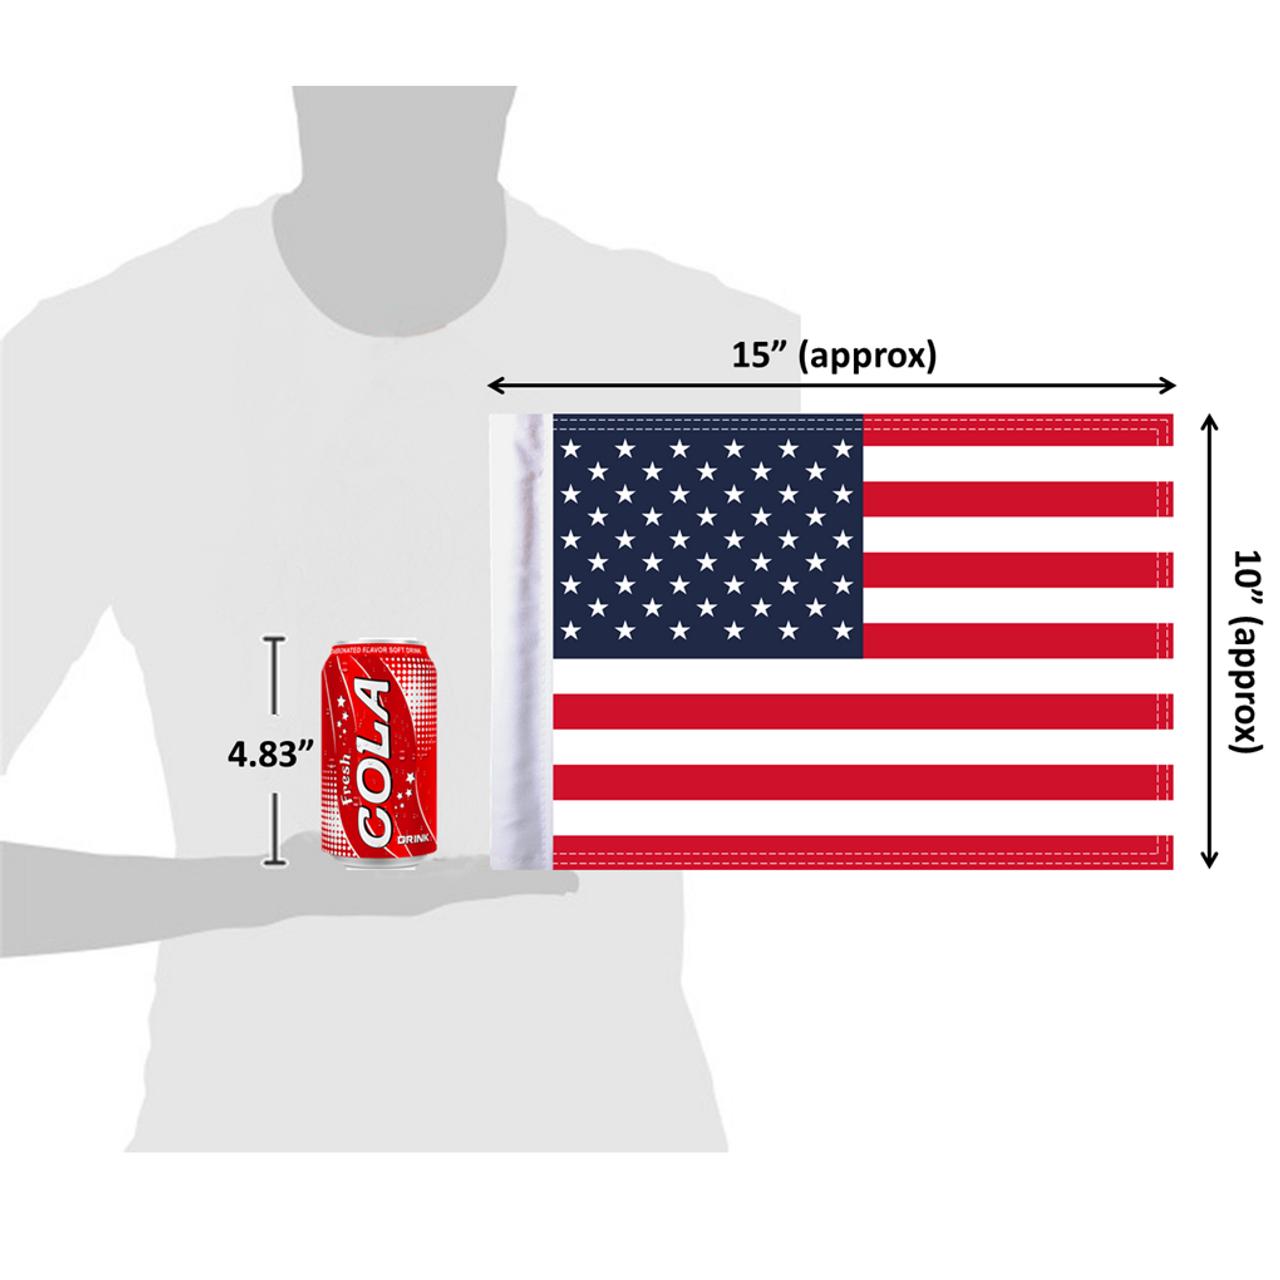 "10""x15"" United States of America (size comparison view)"